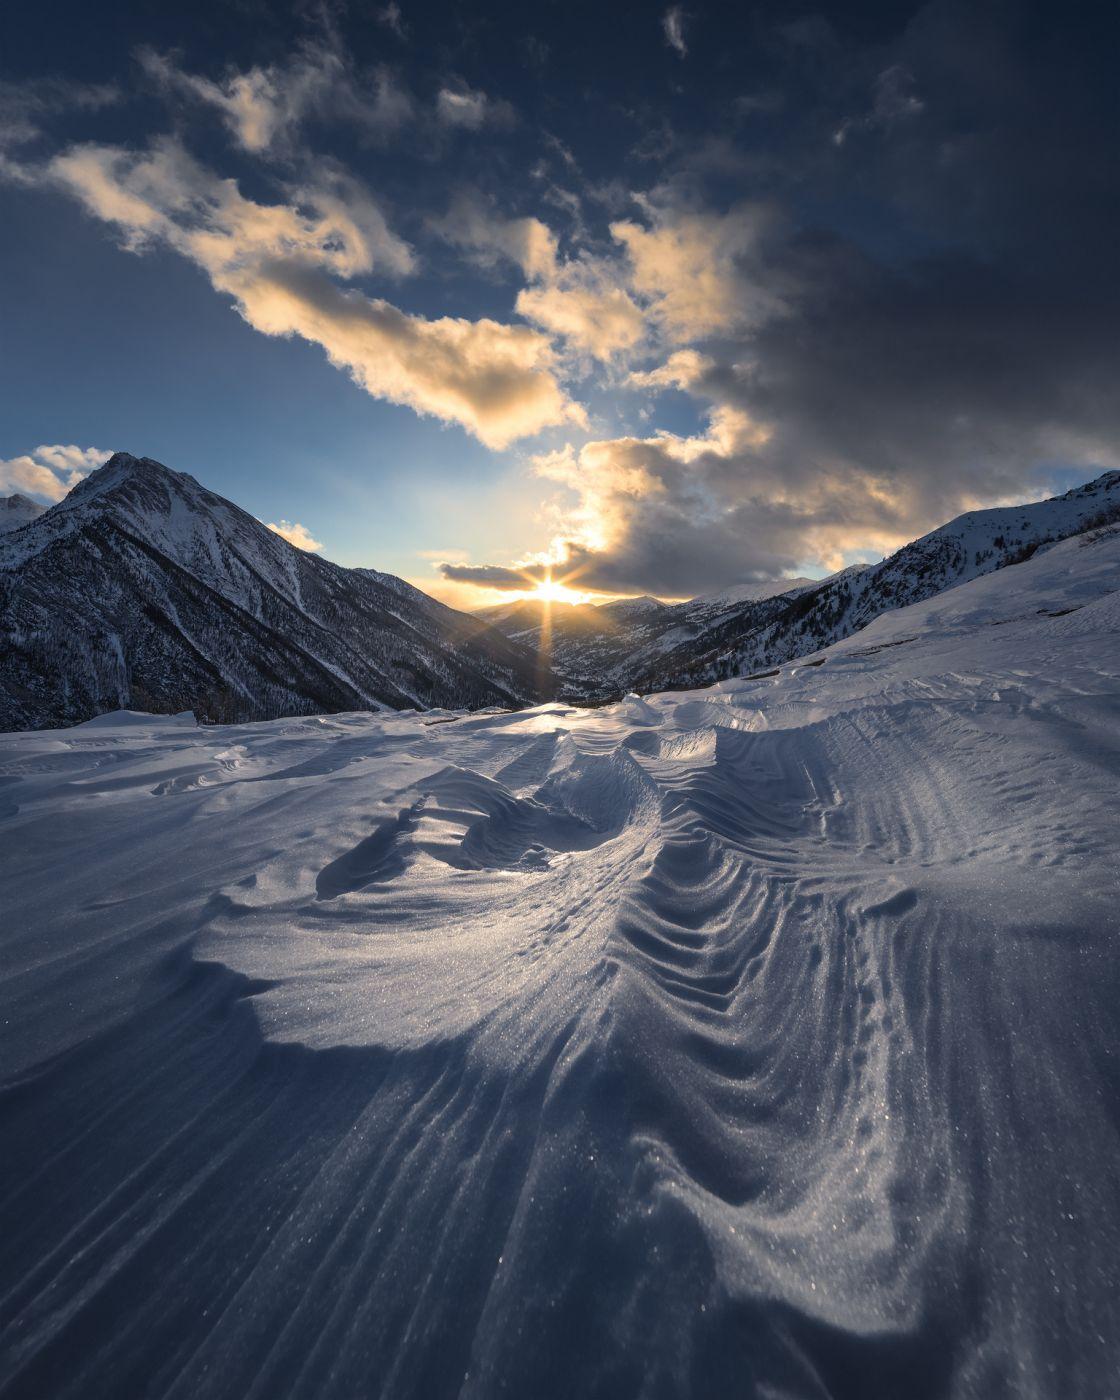 Pian dell'Alpe, Italy